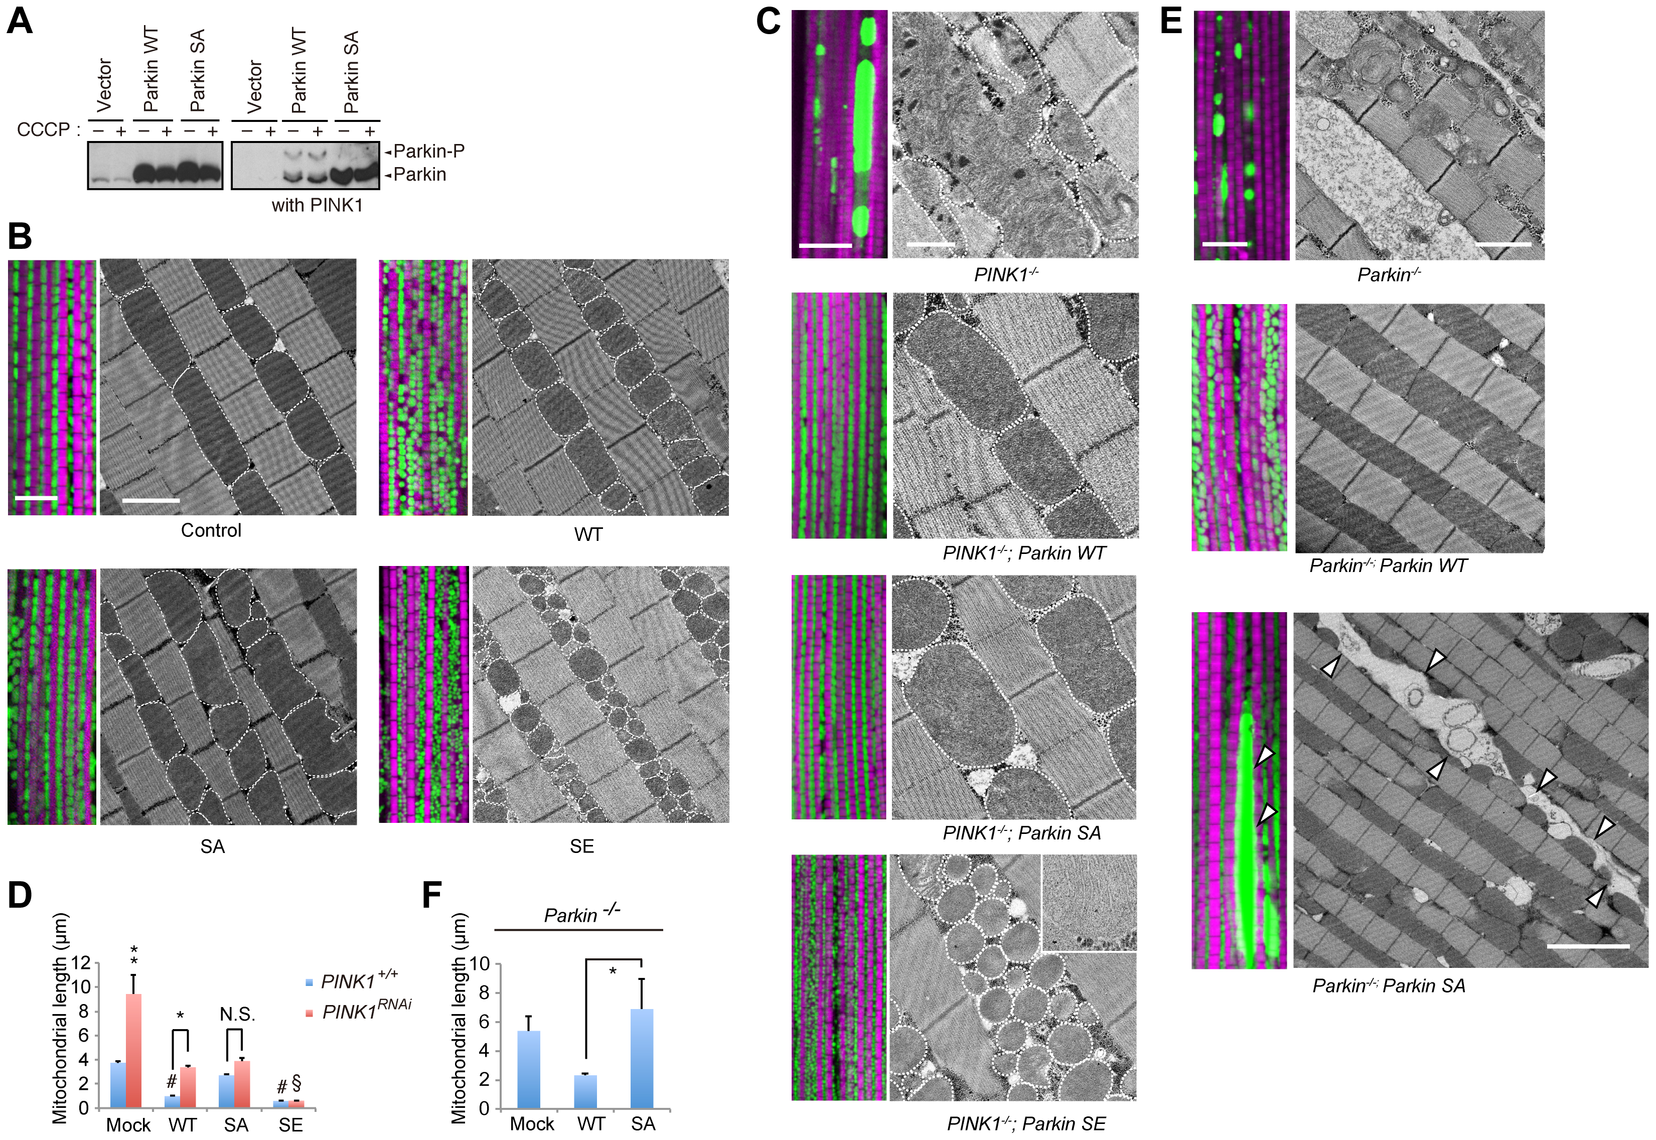 Phosphorylation of the Parkin Ubl domain regulates mitochondrial morphology.